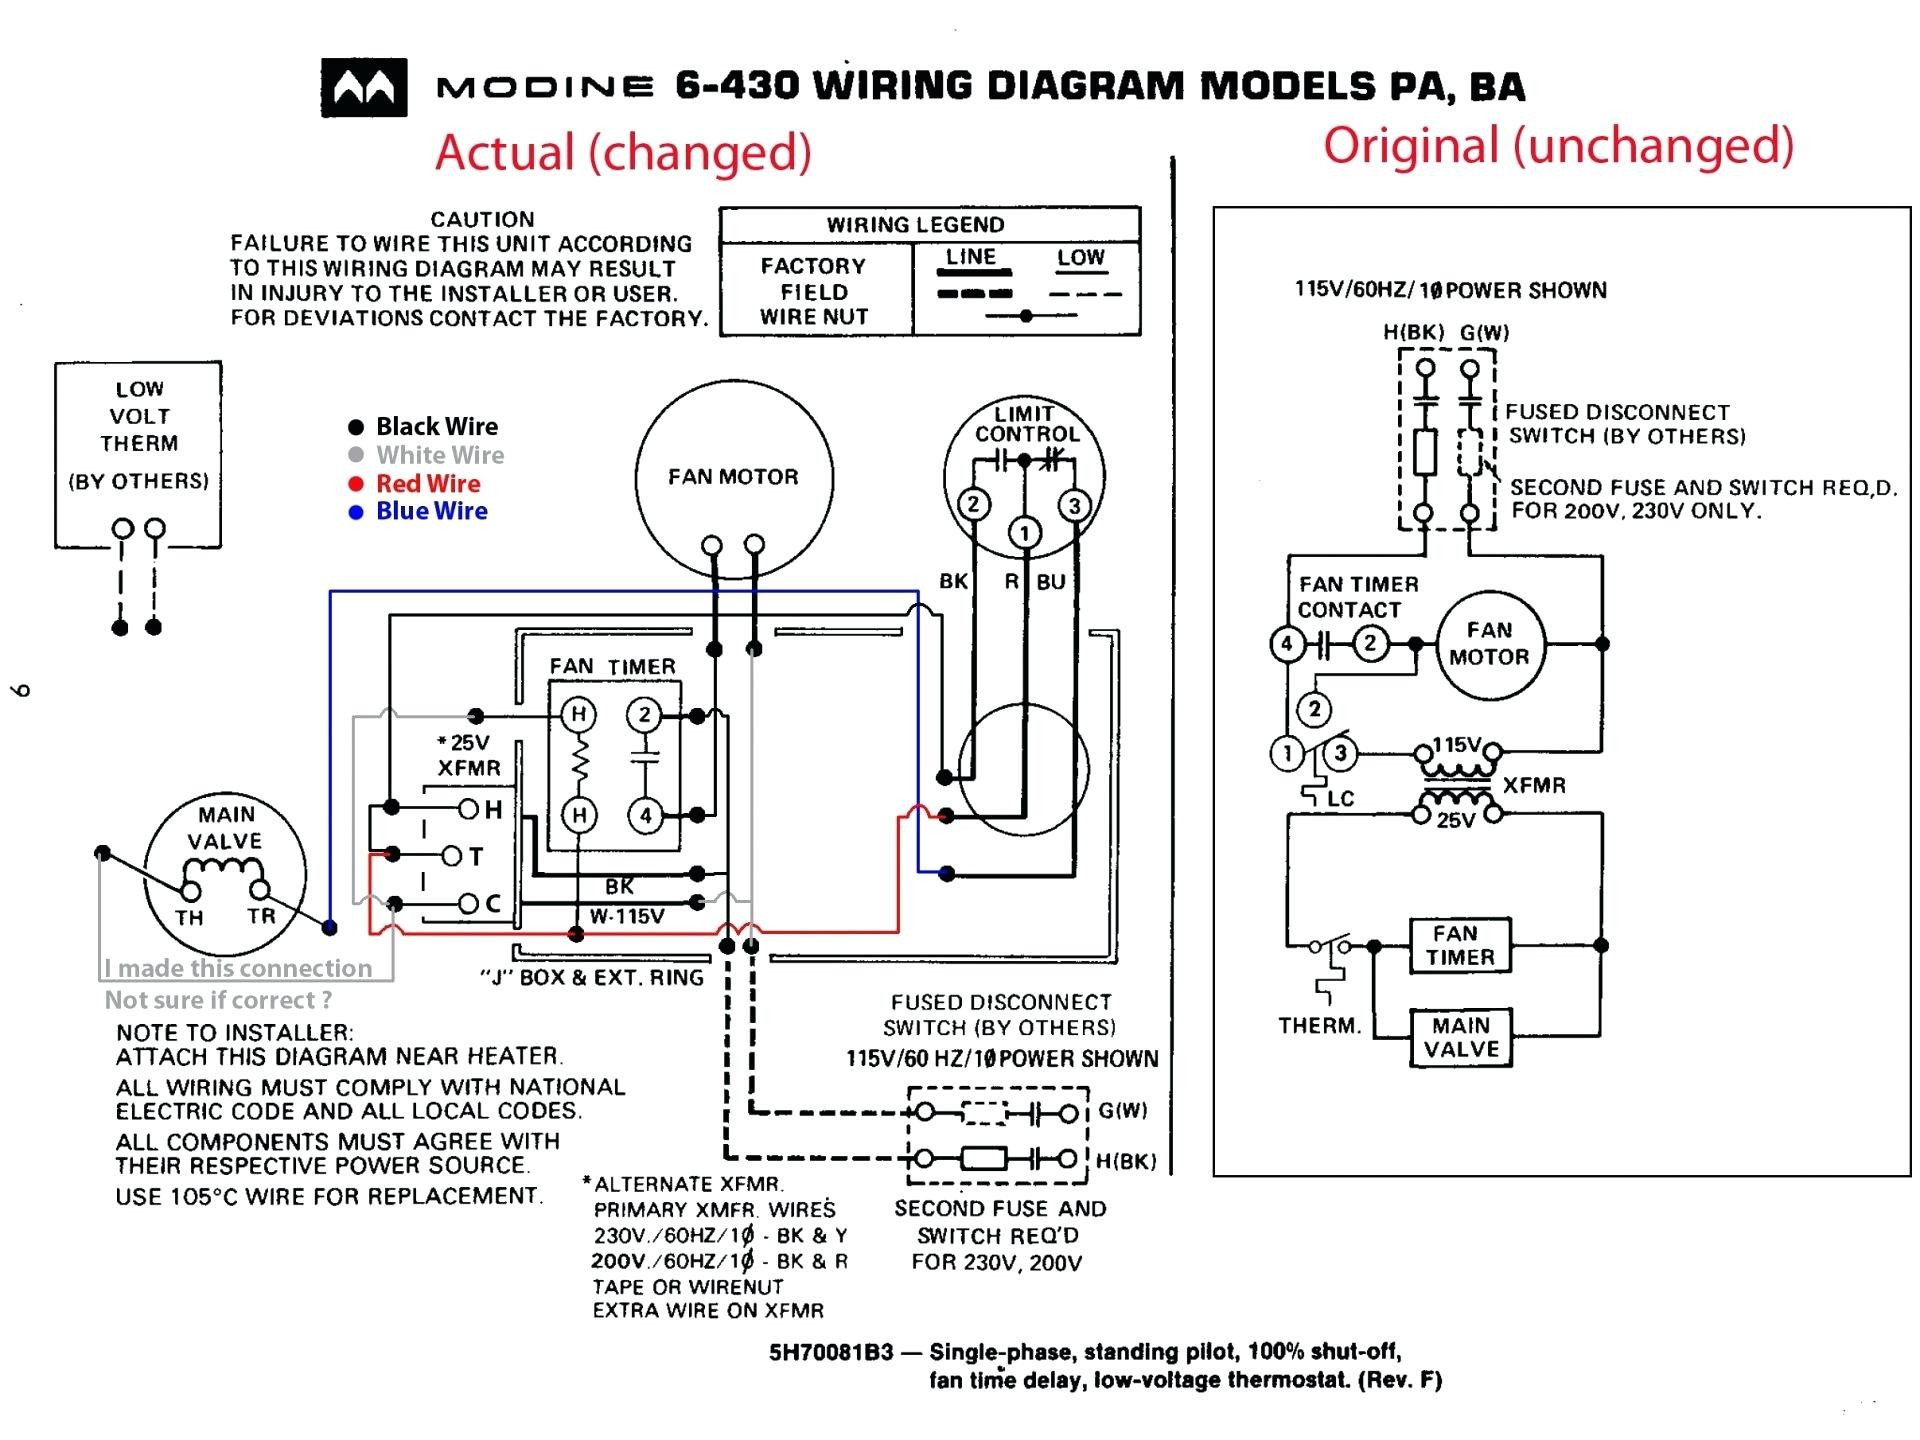 Car Heater Blower Motor Wiring Diagram 1966 Chevy Impala Hvac Trane Furnace Older Gas Basic